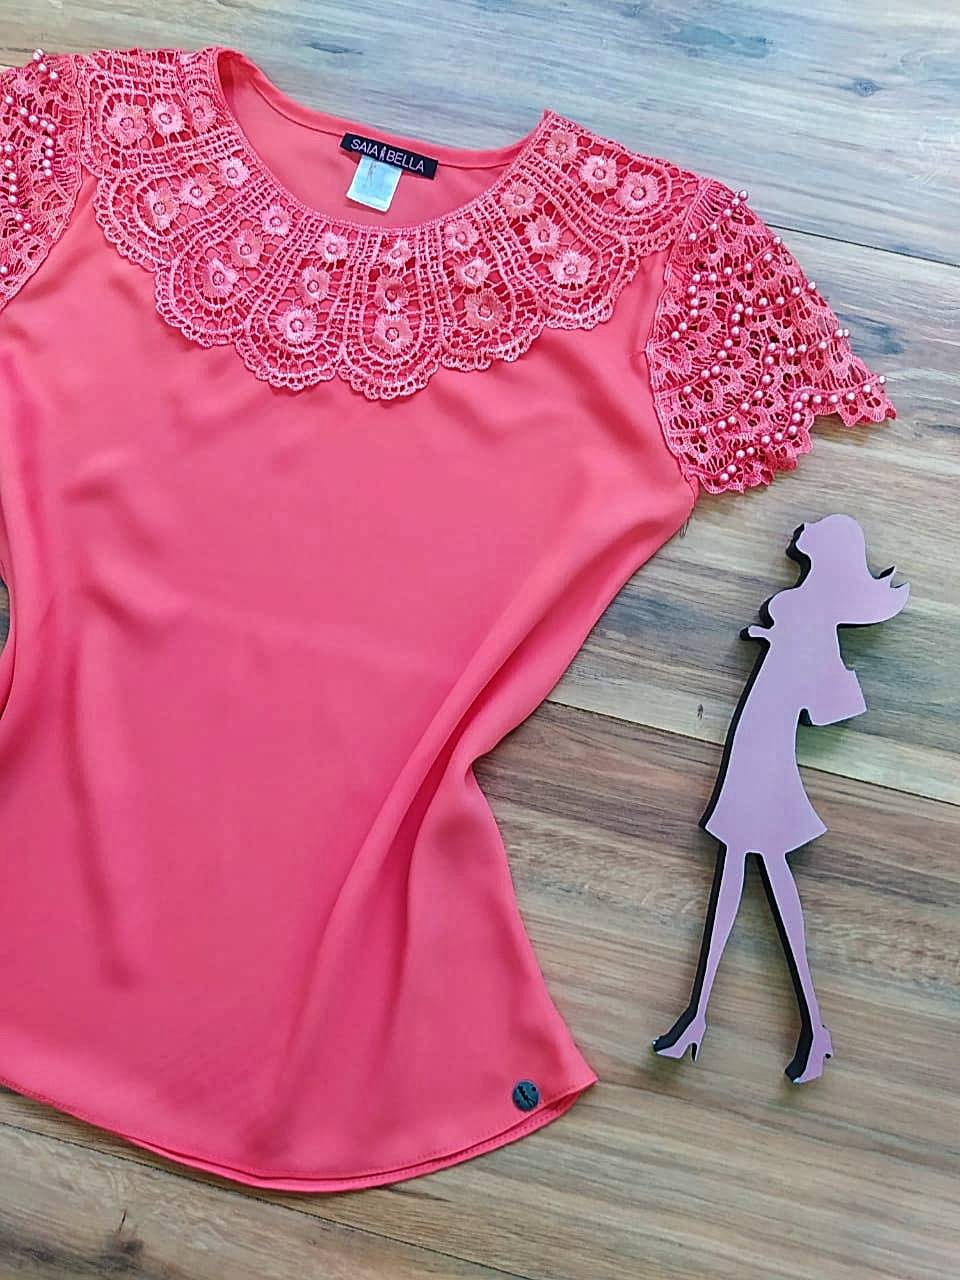 Blusa Fiorella de Renda Saia Bella - SB79902 Coral